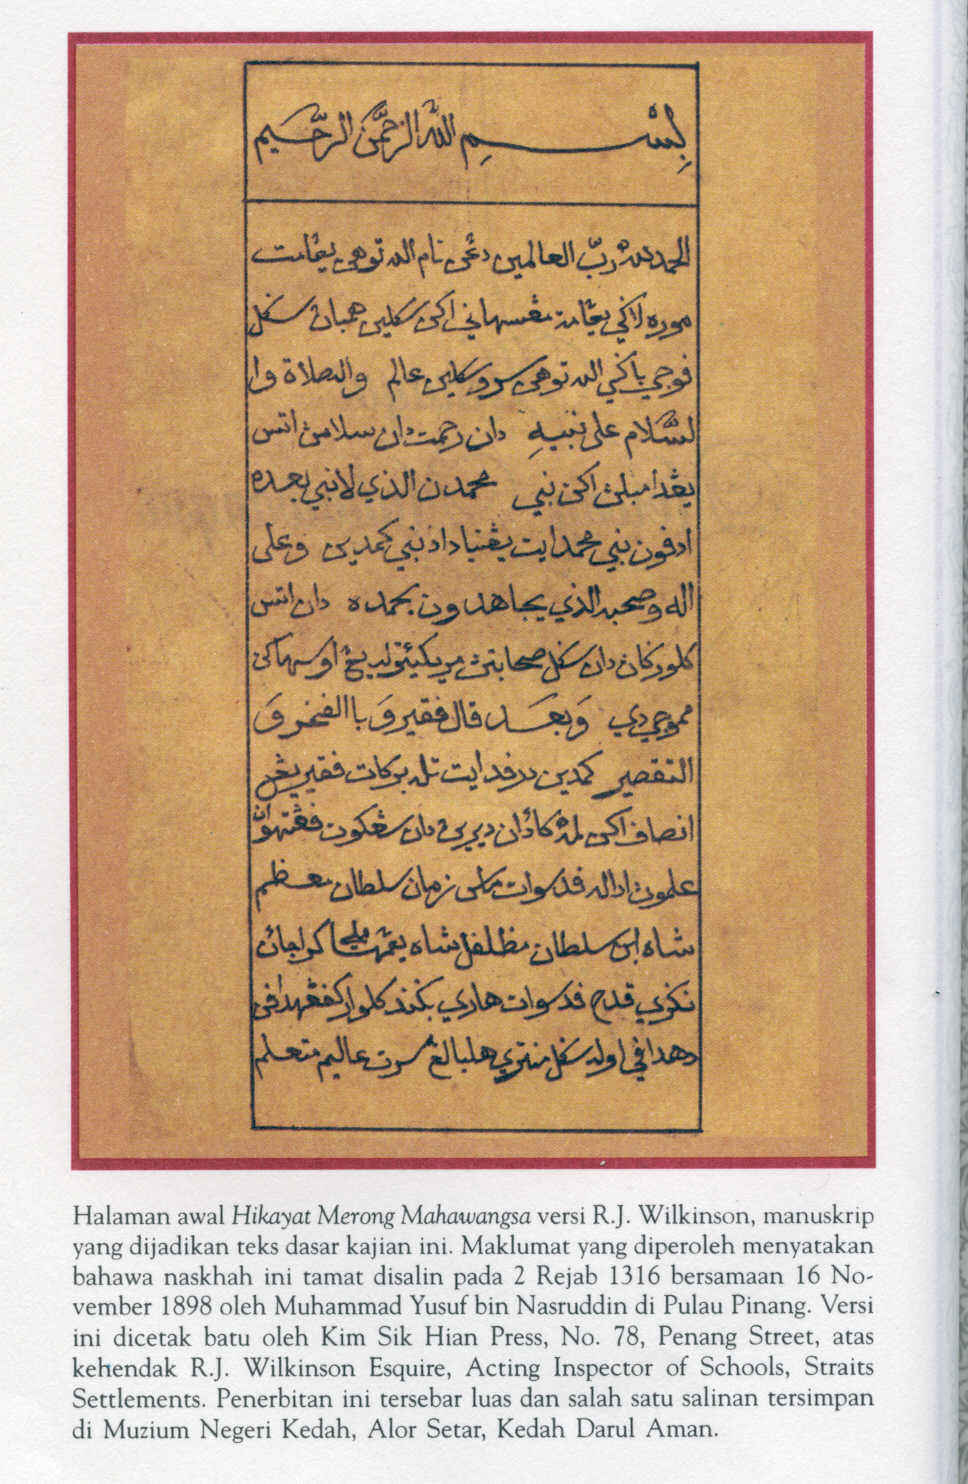 http://upload.wikimedia.org/wikipedia/commons/9/95/Hkyt_merong_mahawgsa.jpg